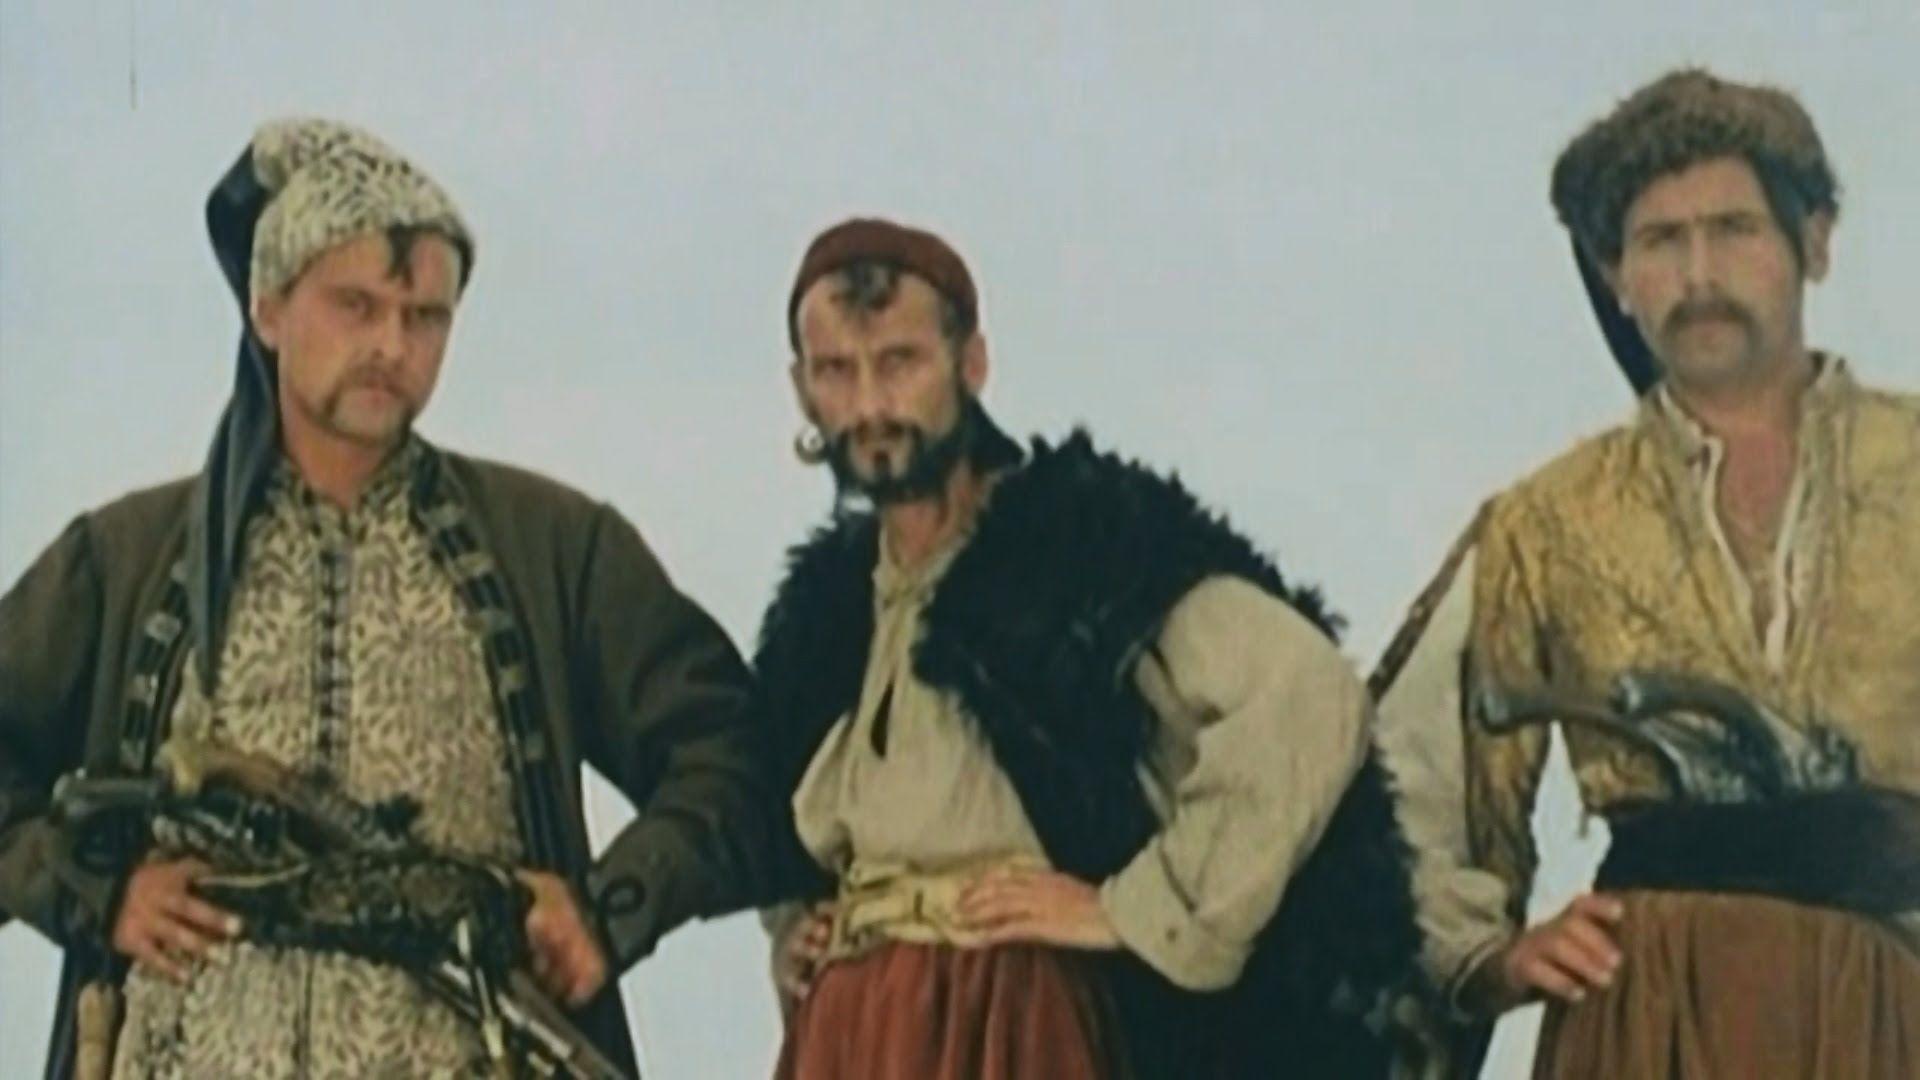 Запорозький марш \ Zaporizhian March Folk song